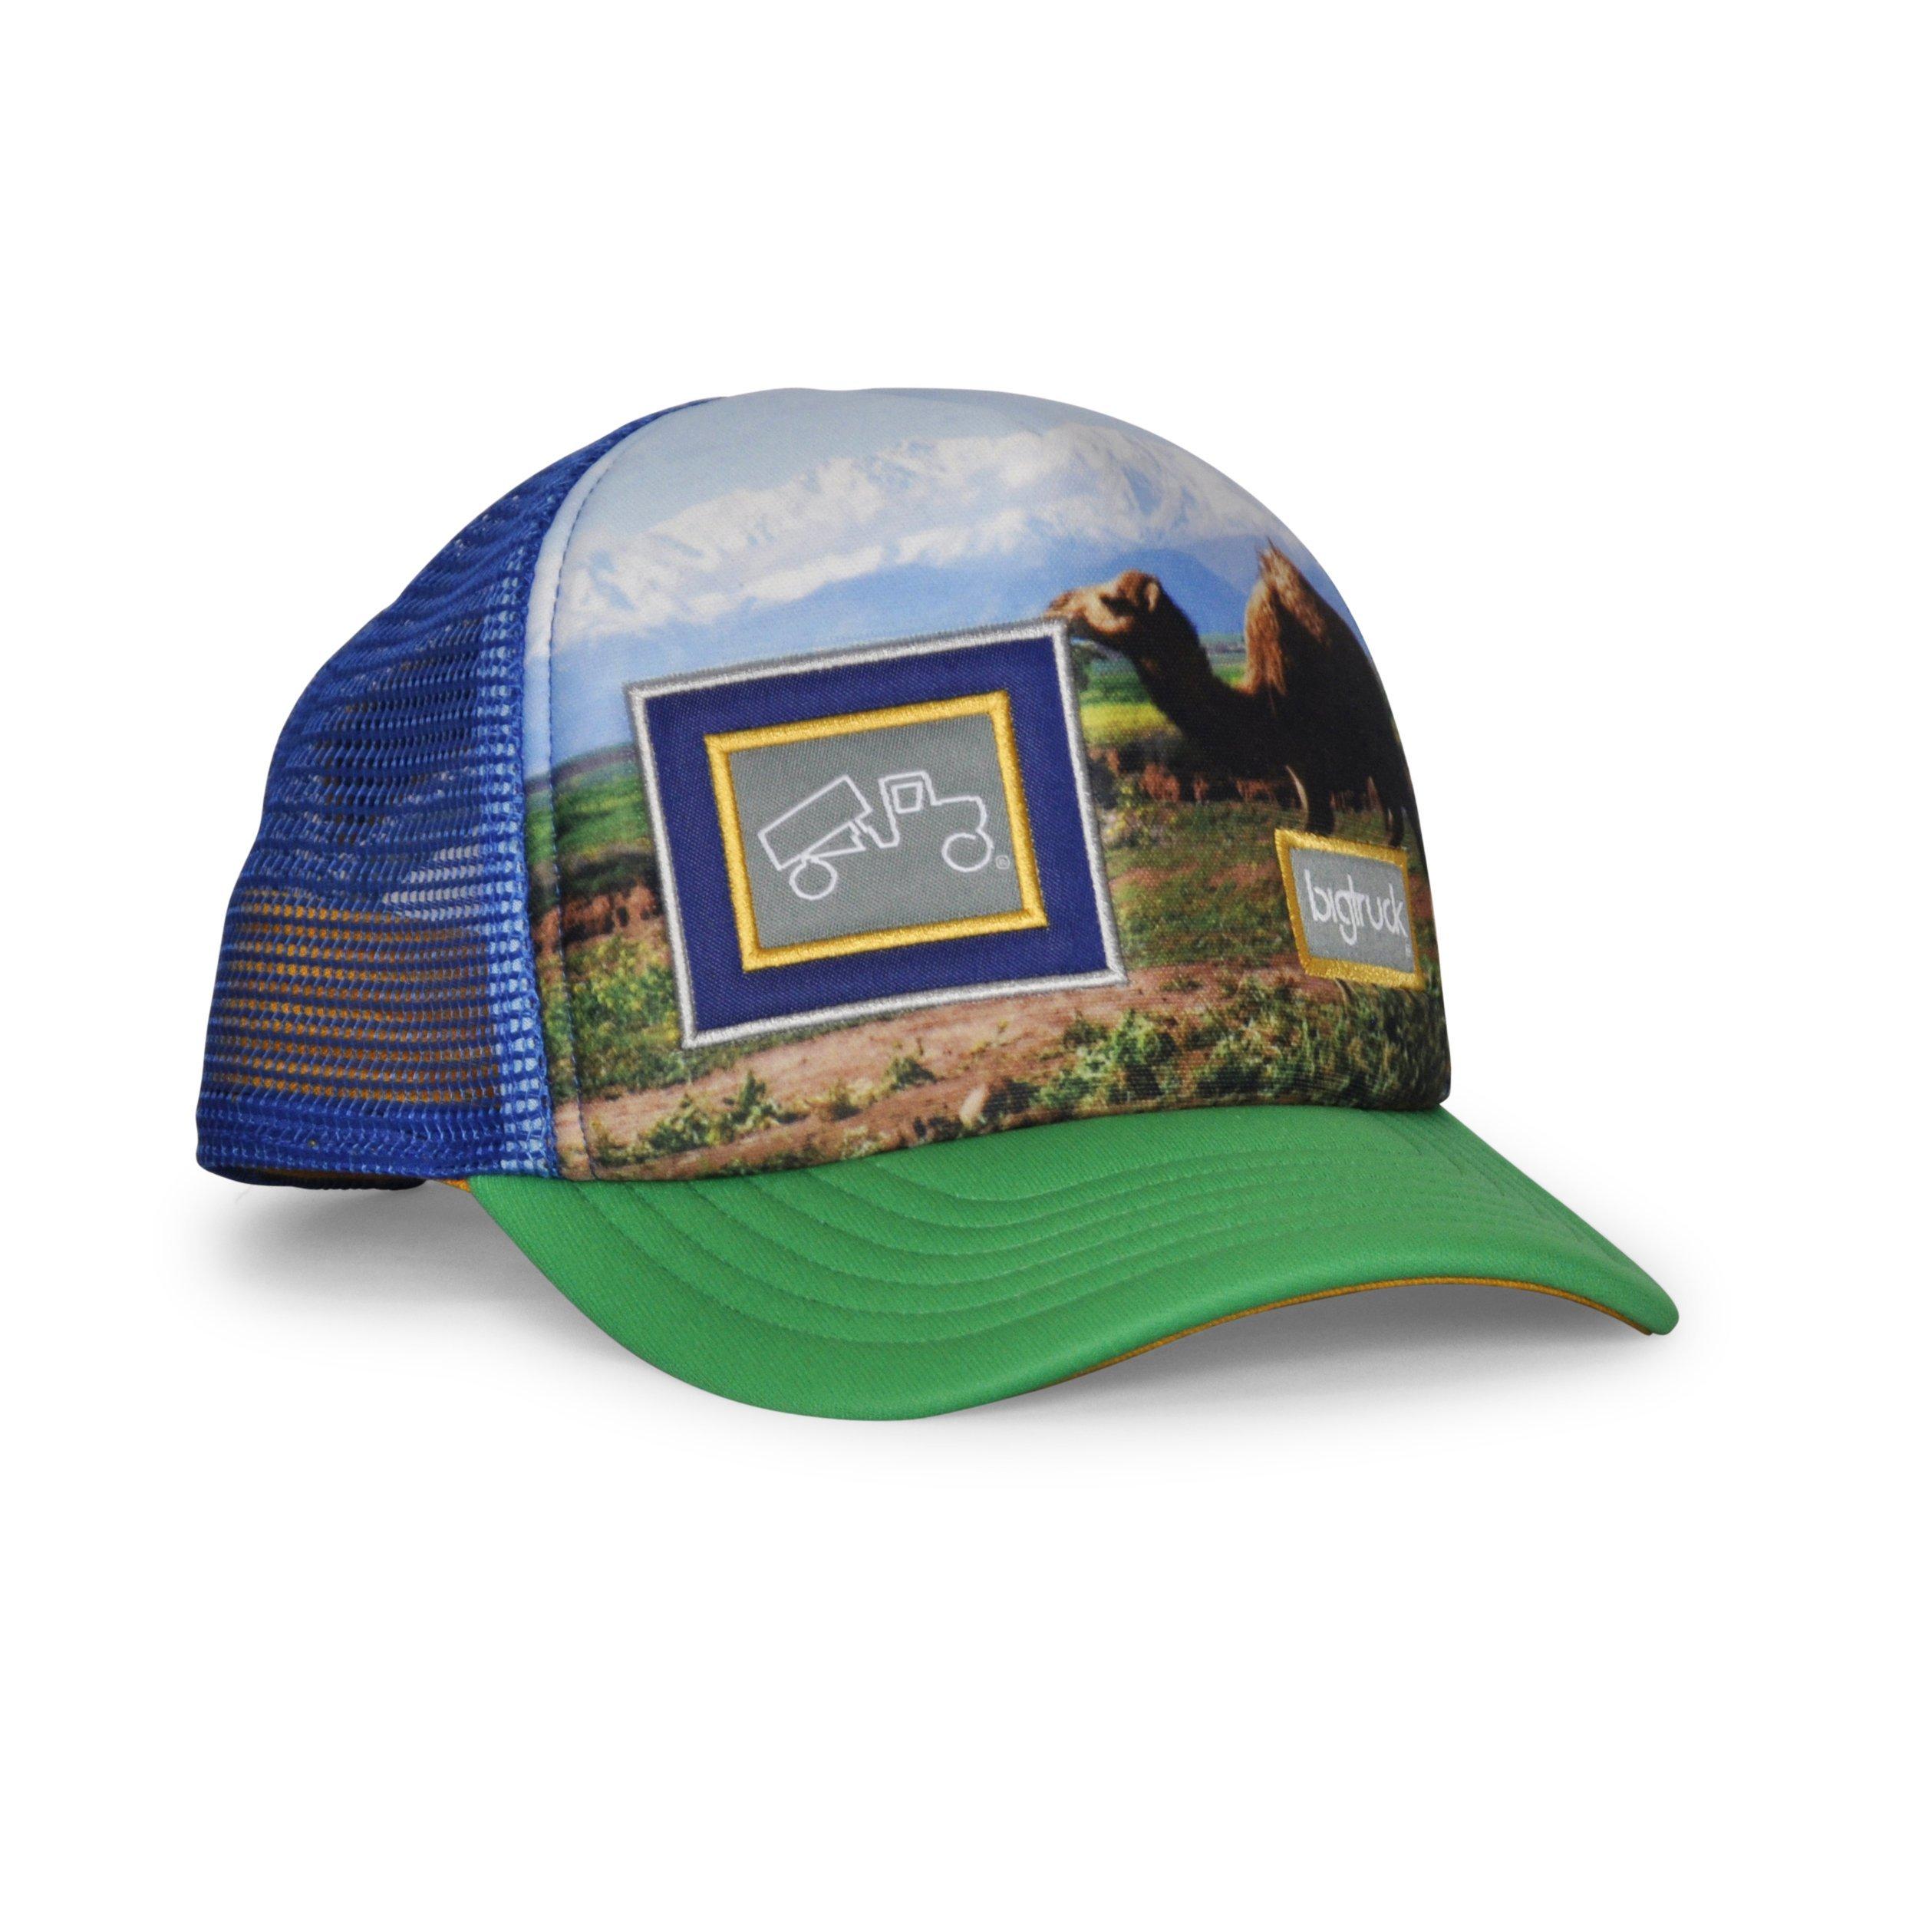 bigtruck Original Toddler Mesh Snapback Toddler Trucker Hat, Green